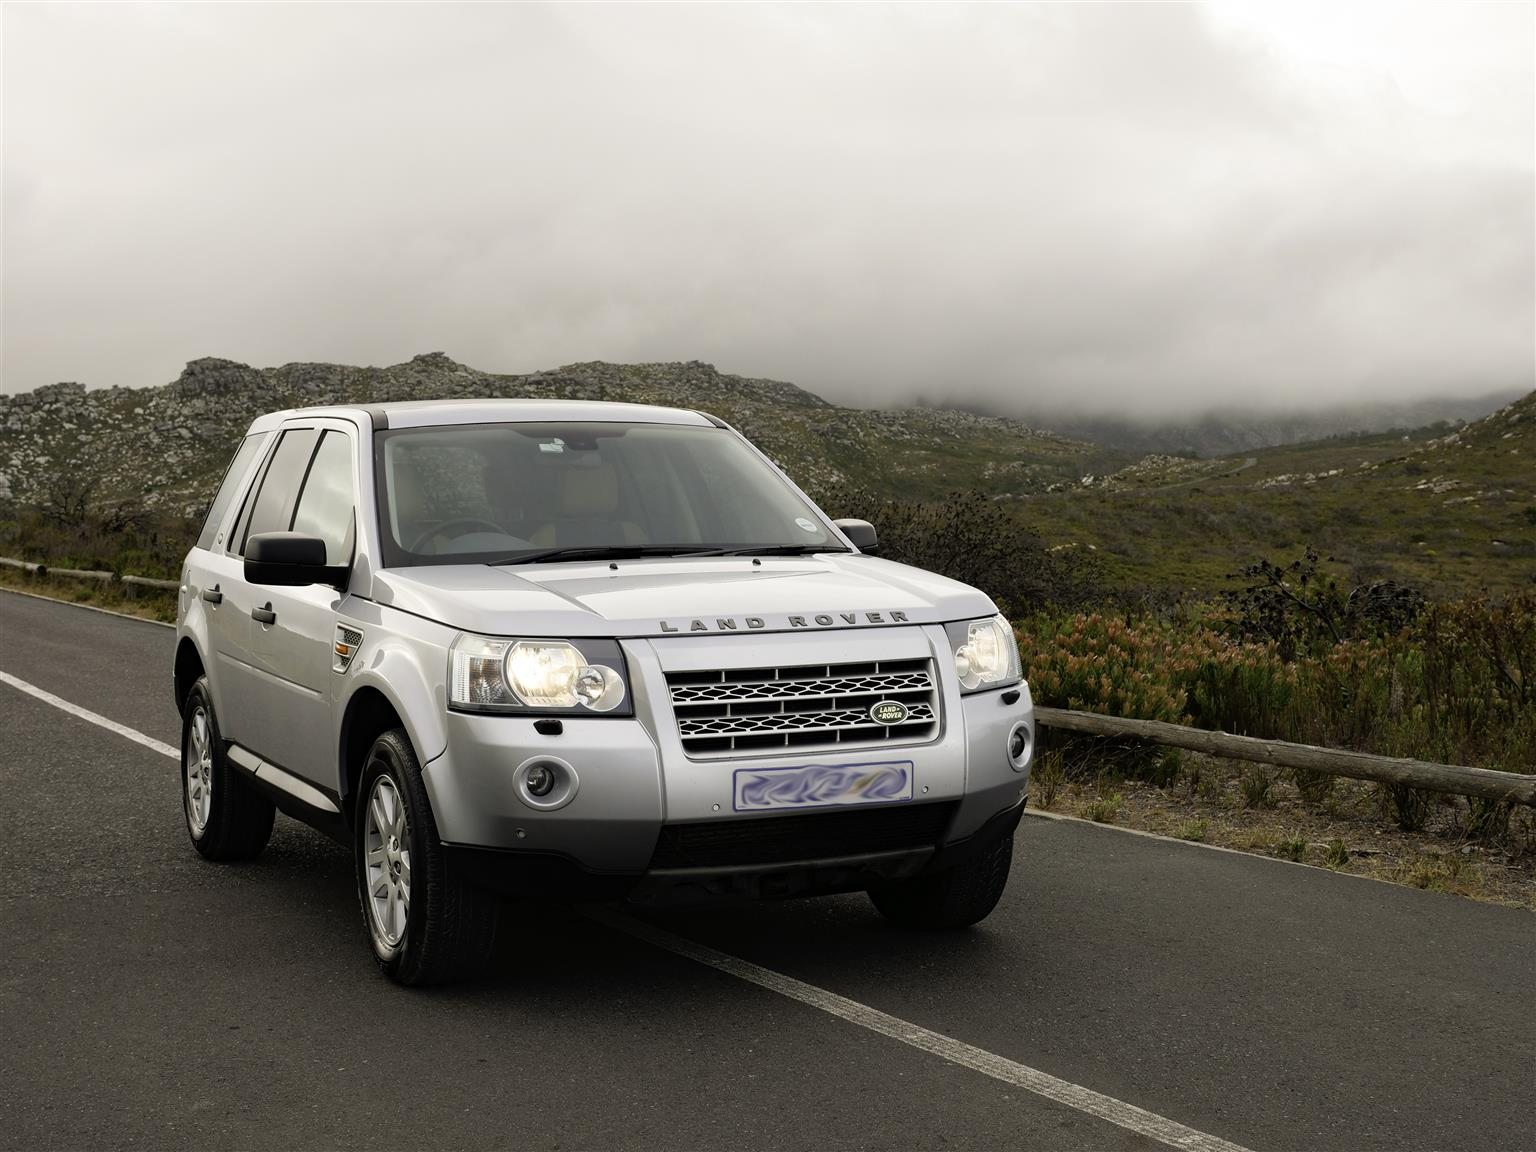 2007 land rover freelander towing capacity